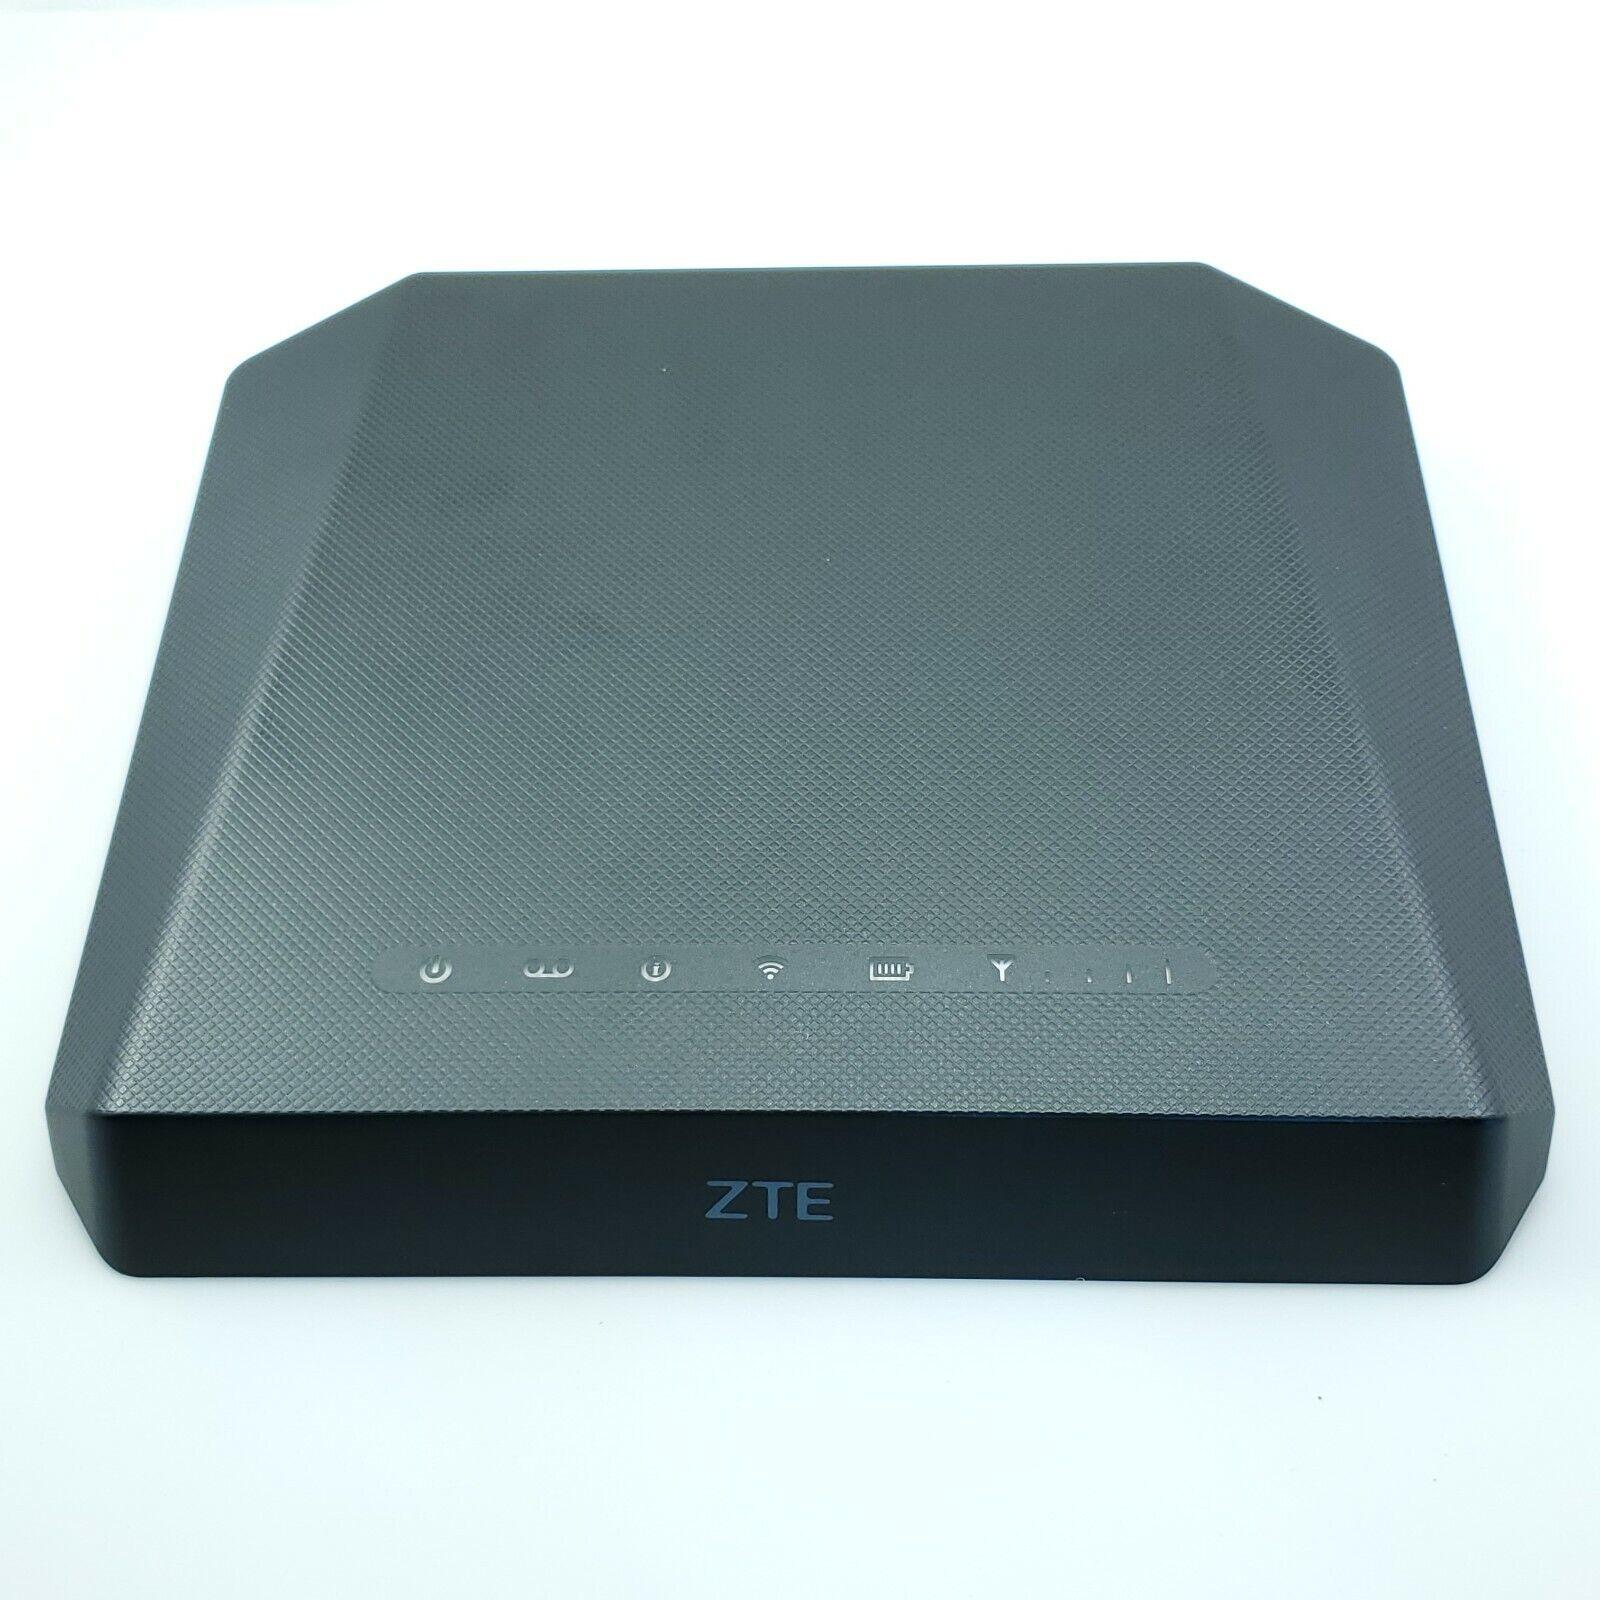 ZTE MF288 Turbo 4G LTE Unlocked Wi-Fi Router